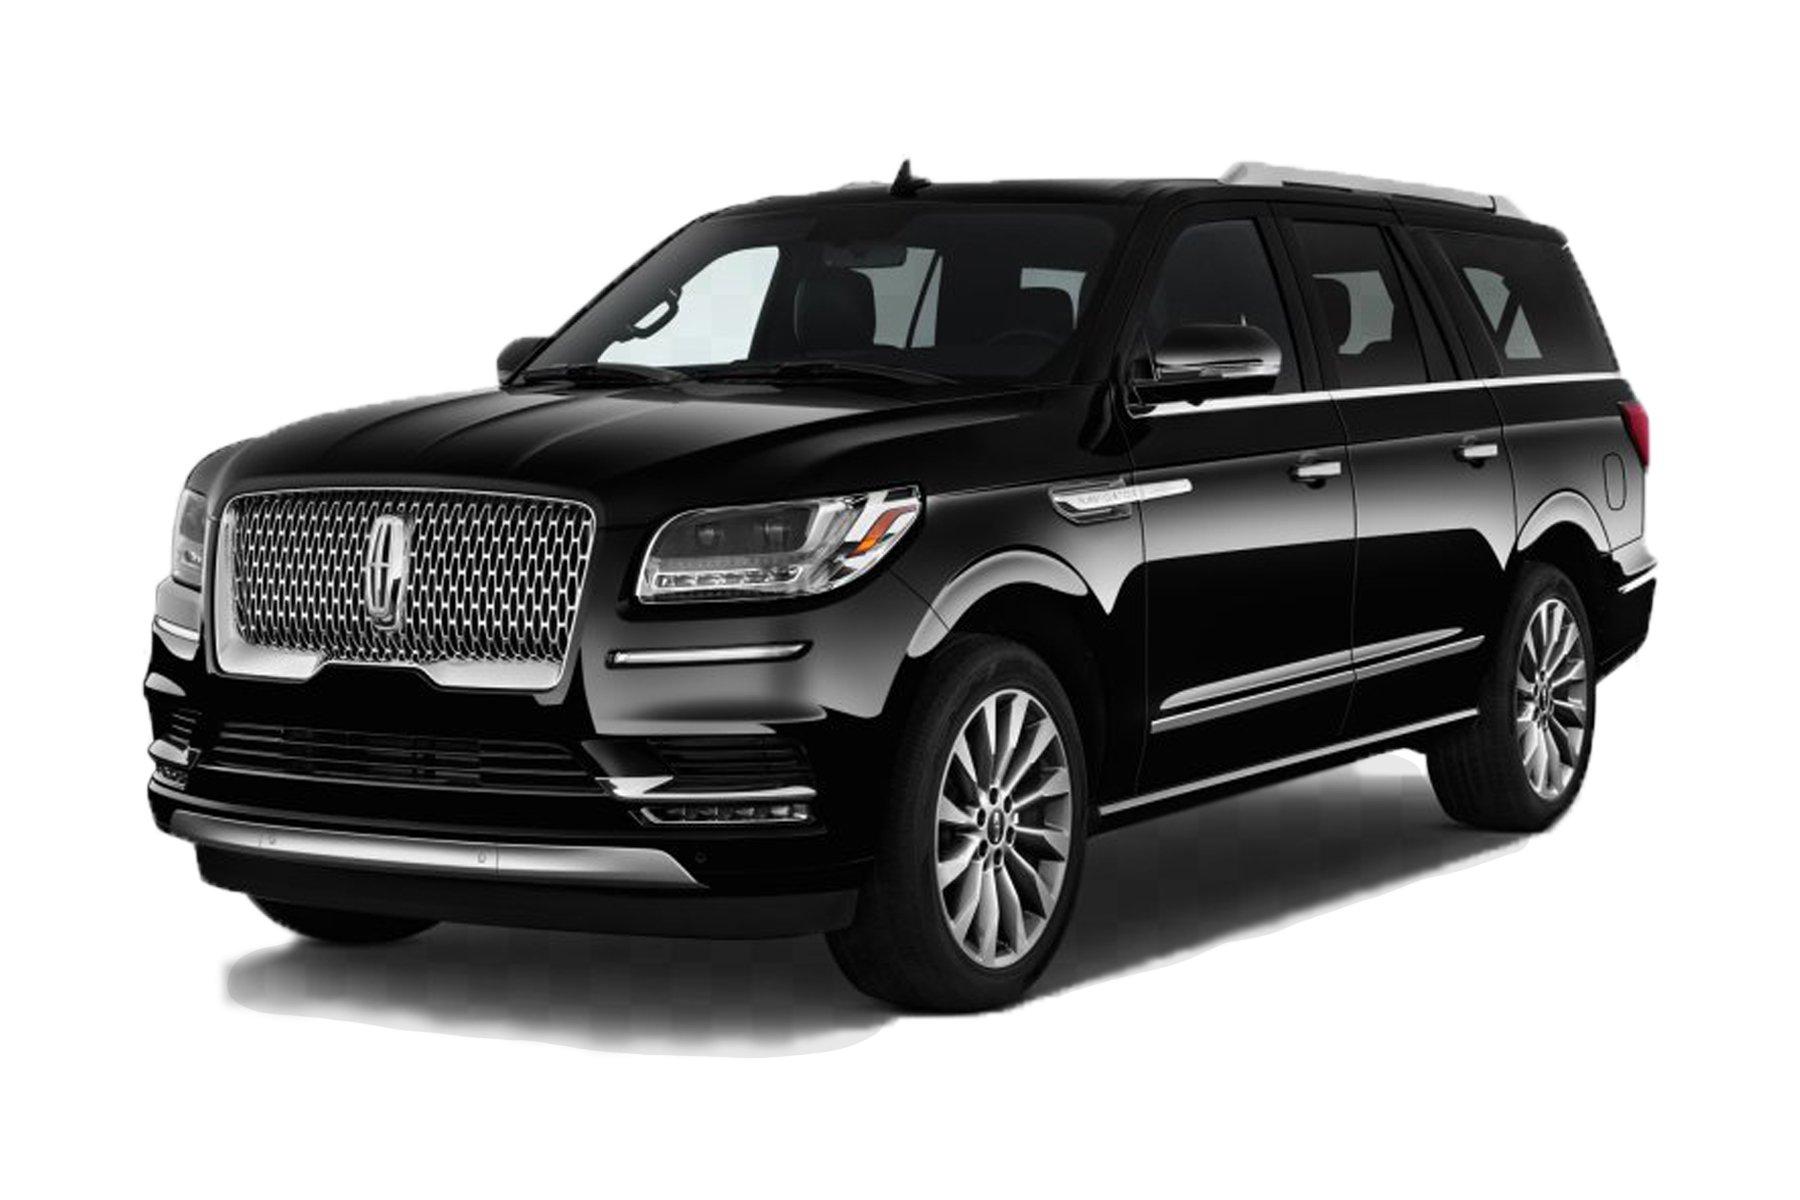 Skyline Chicago Limo Cars Luxury Fleet Black Lincoln Navigator October 2020